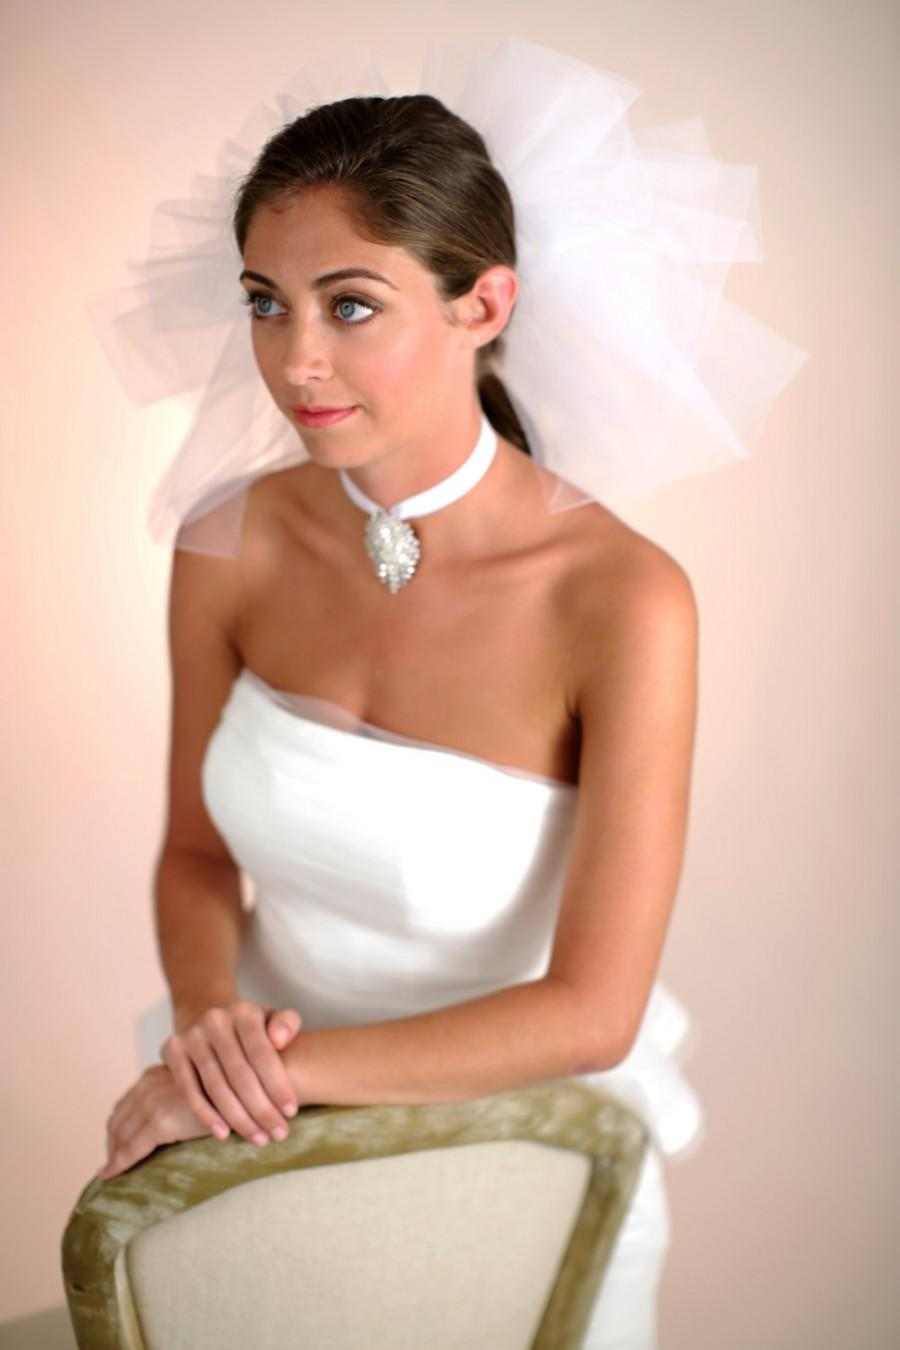 Mariage - Bridal Veil, Three Tier Pouf Veil, Wedding Veil, Tulle Poufs, Accessories, Veils, Style No. 4121